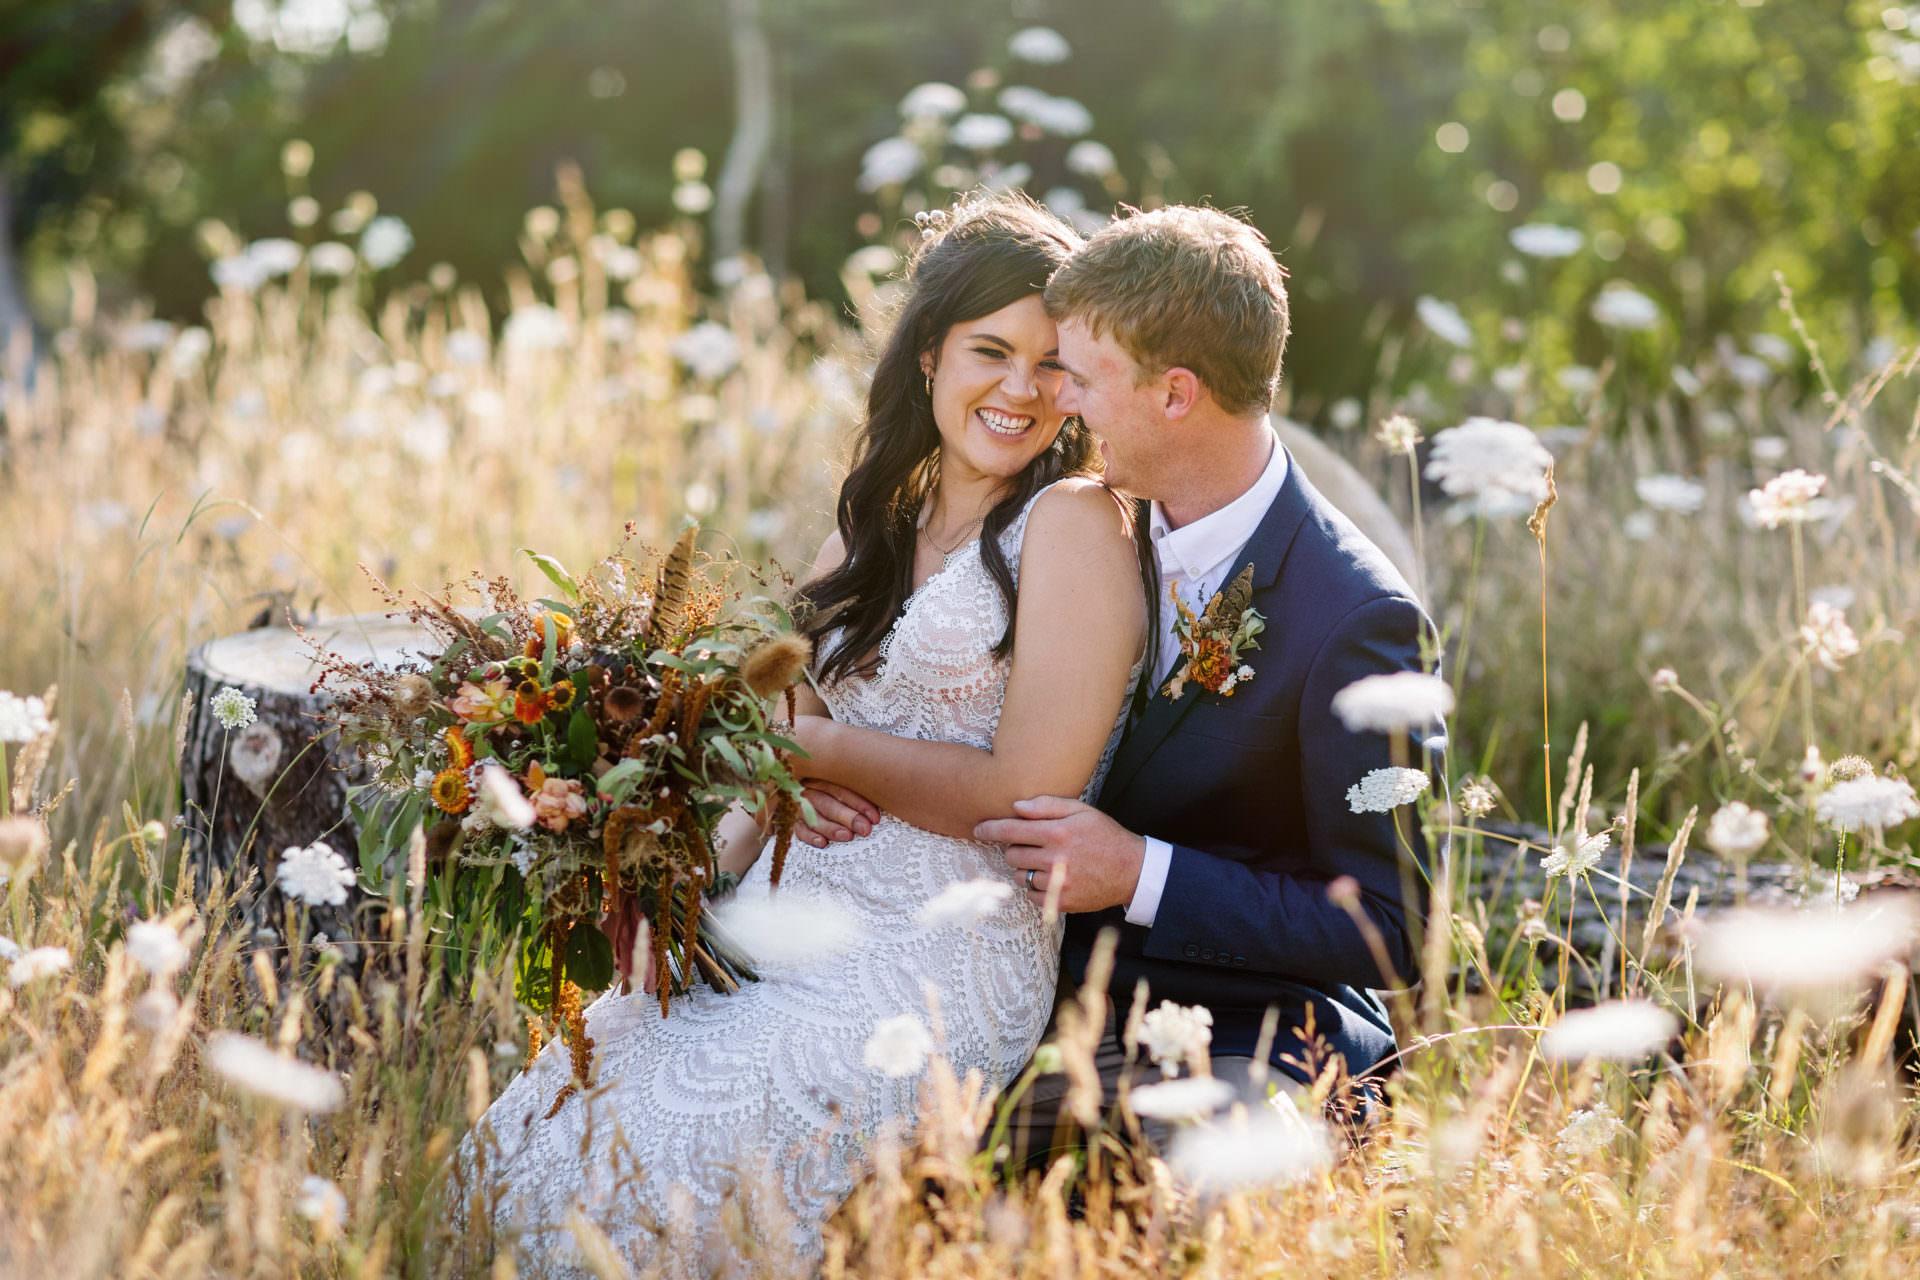 bride and groom flower field wedding photograph